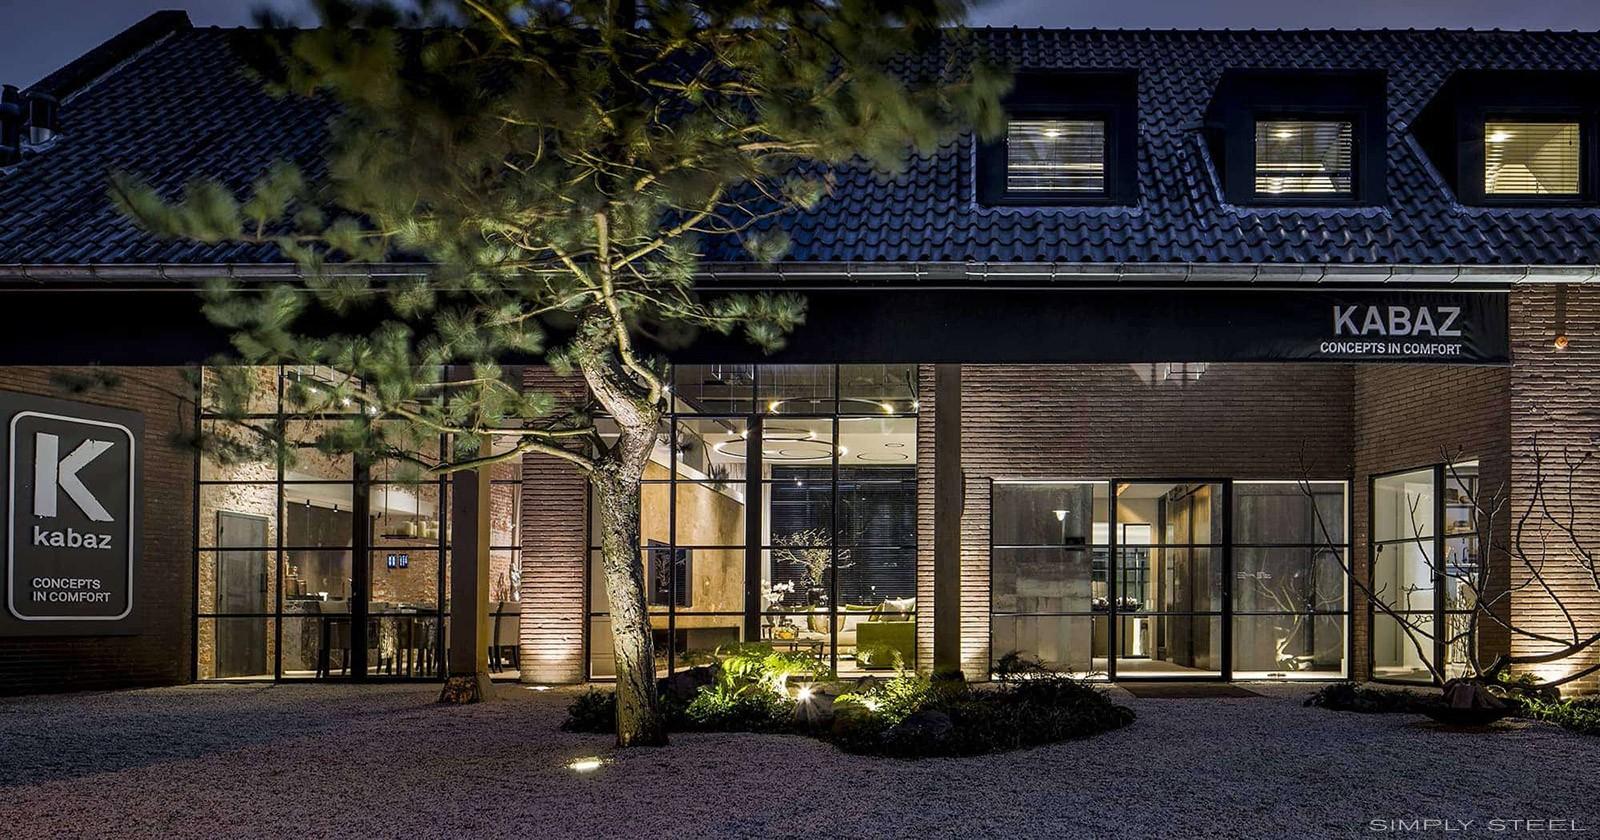 Samenwerking met architectenbureaus, o.a. Kabaz